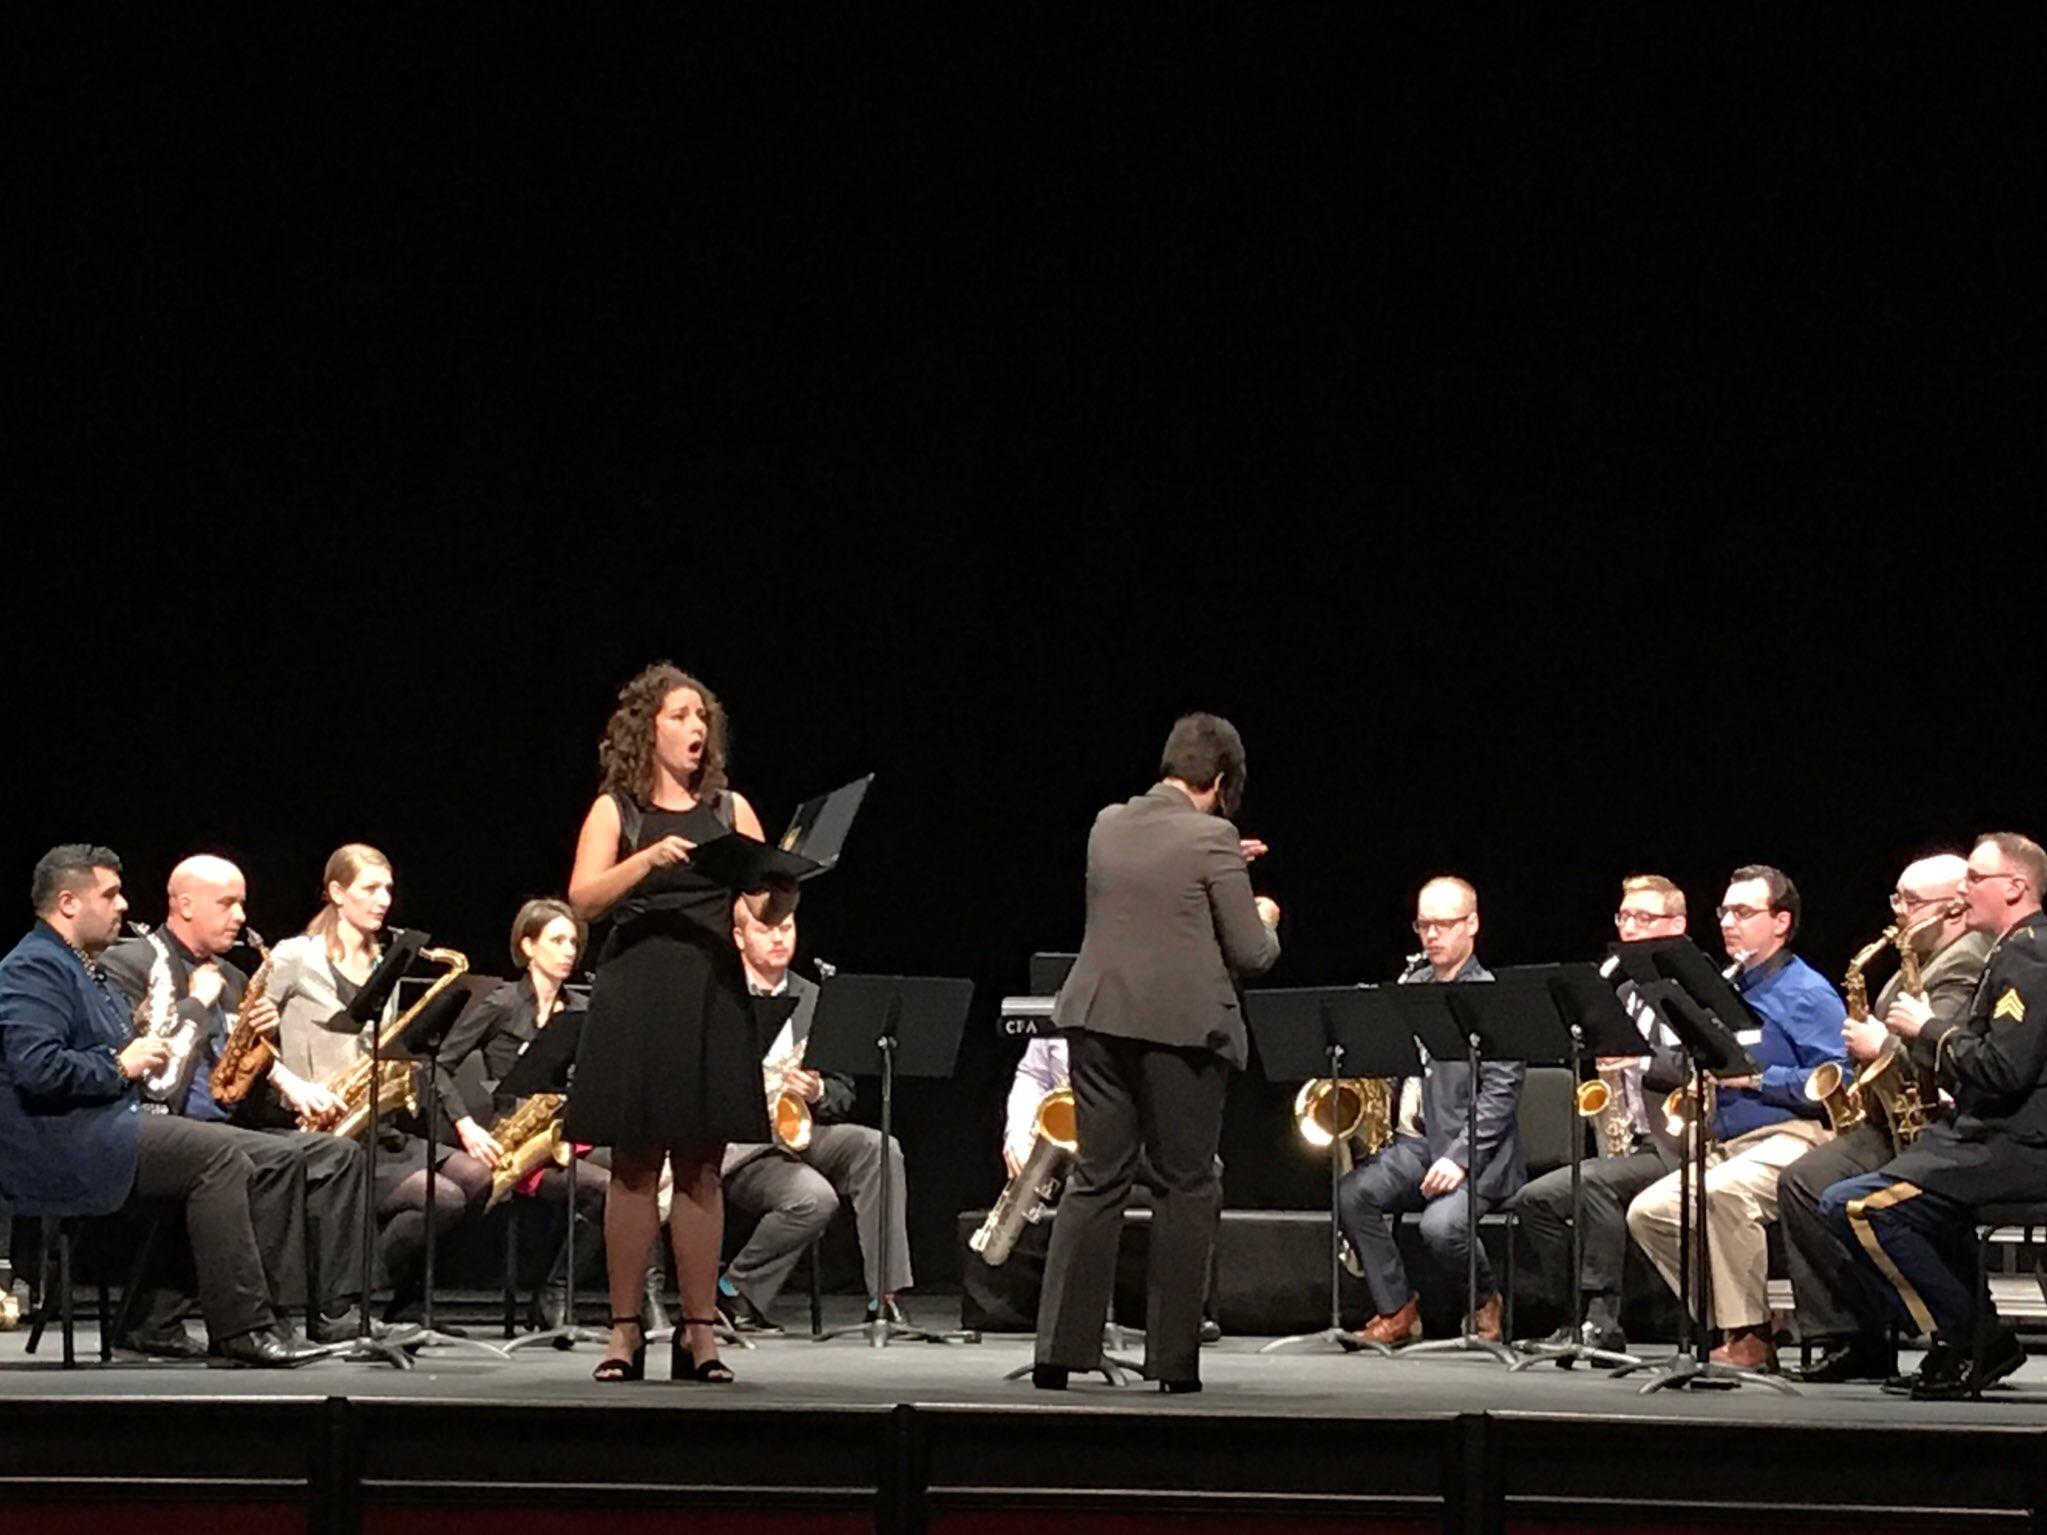 Courtney Ruckman, soprano, and RSO performing at Navy Saxophone Symposium